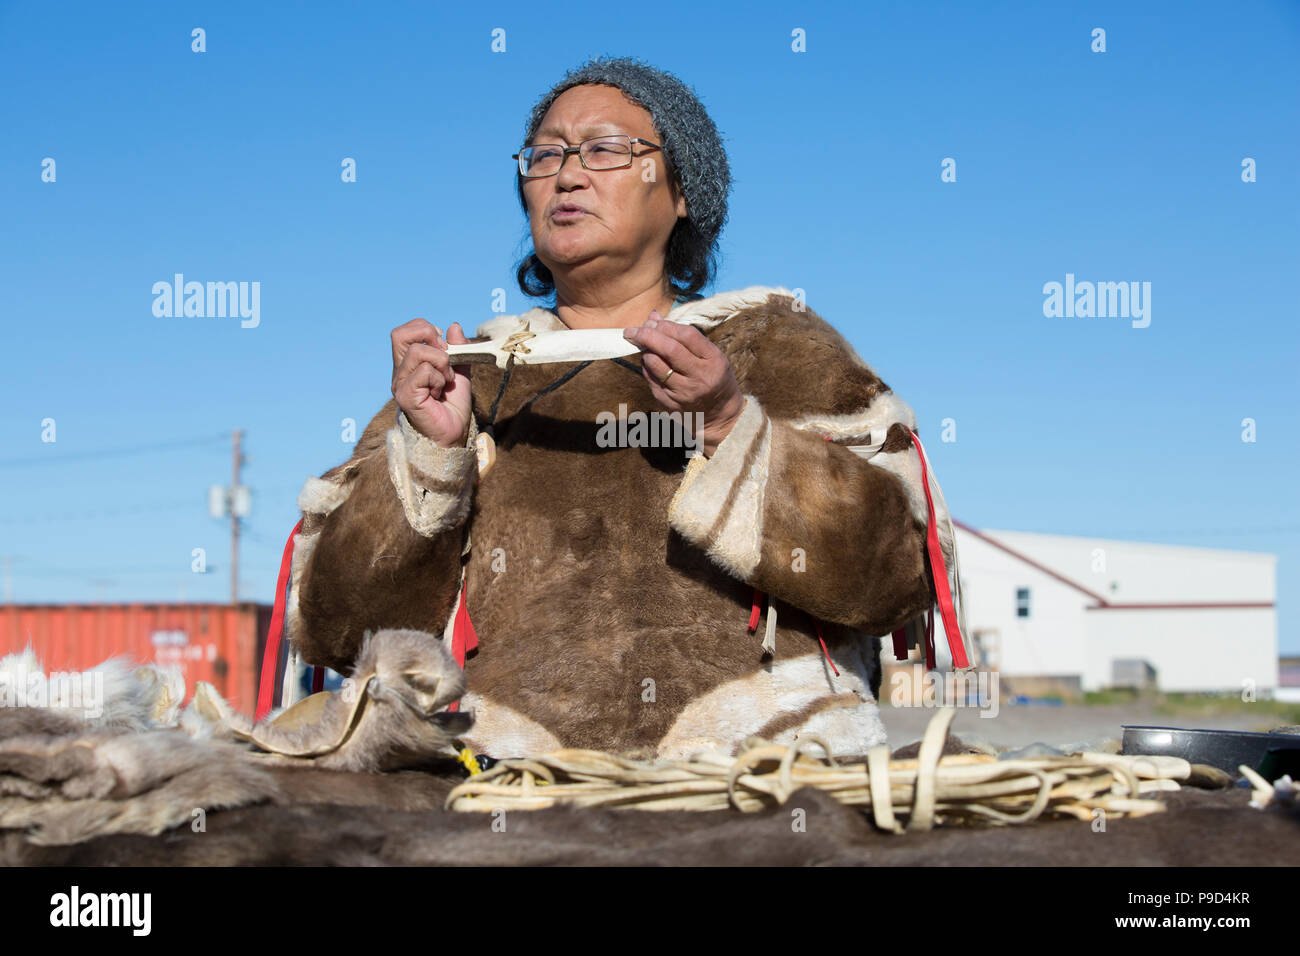 Canada, Nunavut, Hudson Bay, Kivalliq, Arviat, local woman demonstrates historic tools used by inuit. - Stock Image